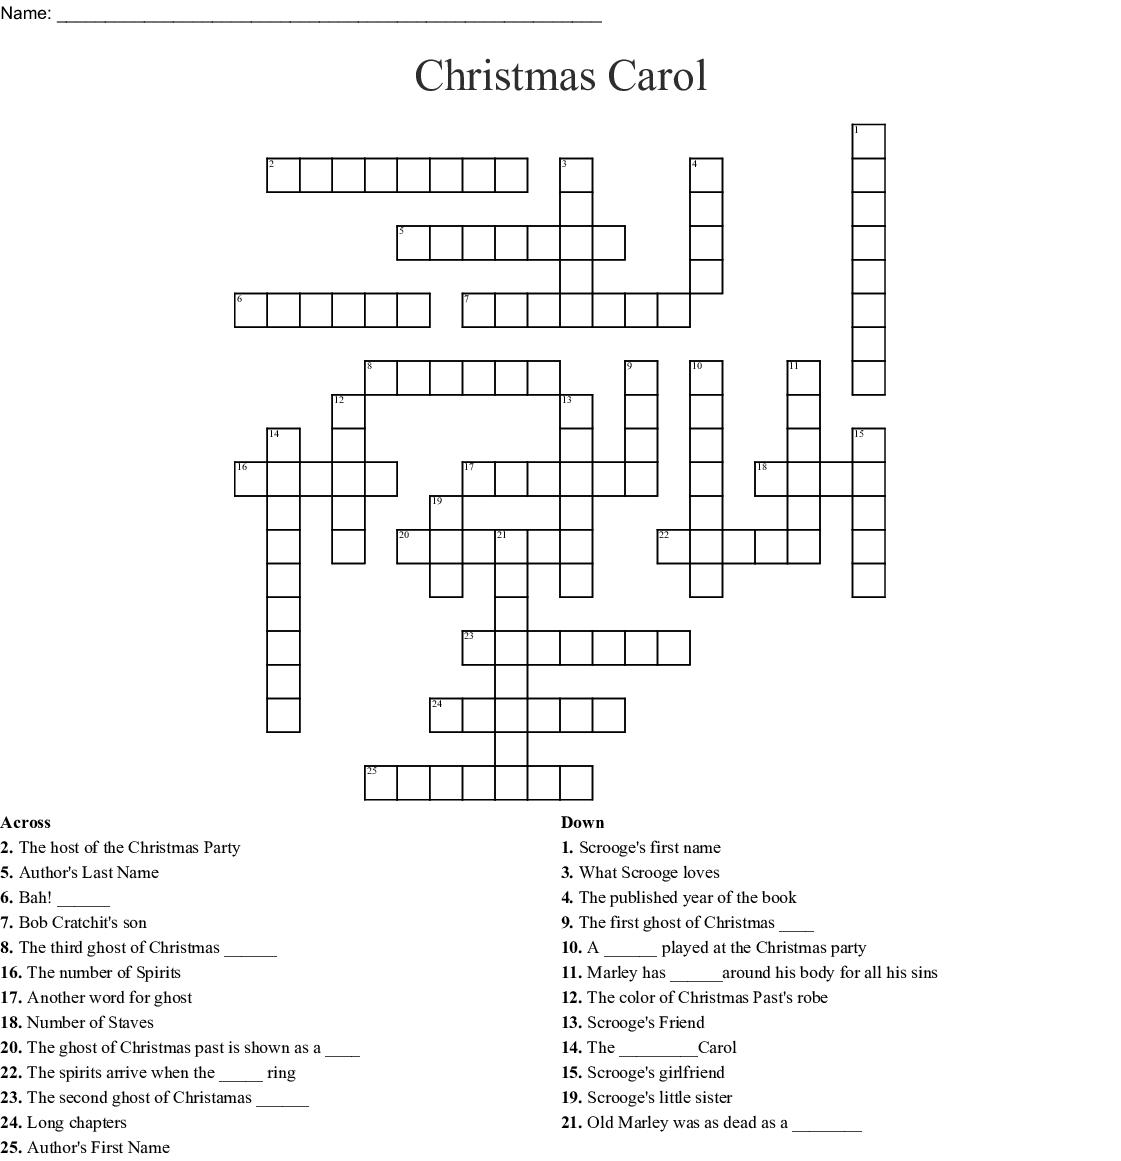 Similar To A Christmas Carol Word Search